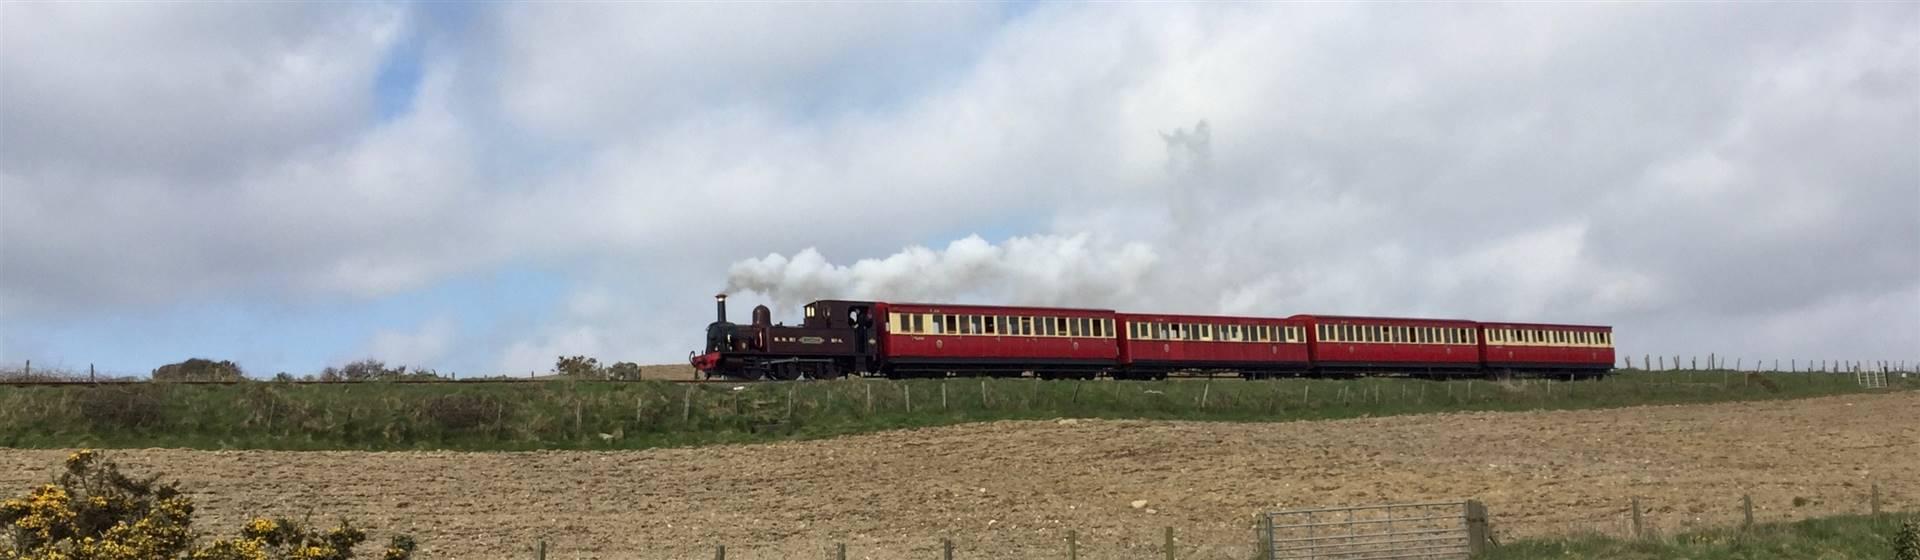 "<img src=""isleofmansteamrailway-adobestock_260236098.jpeg"" alt=""Isle of Man Steam Railway""/>"